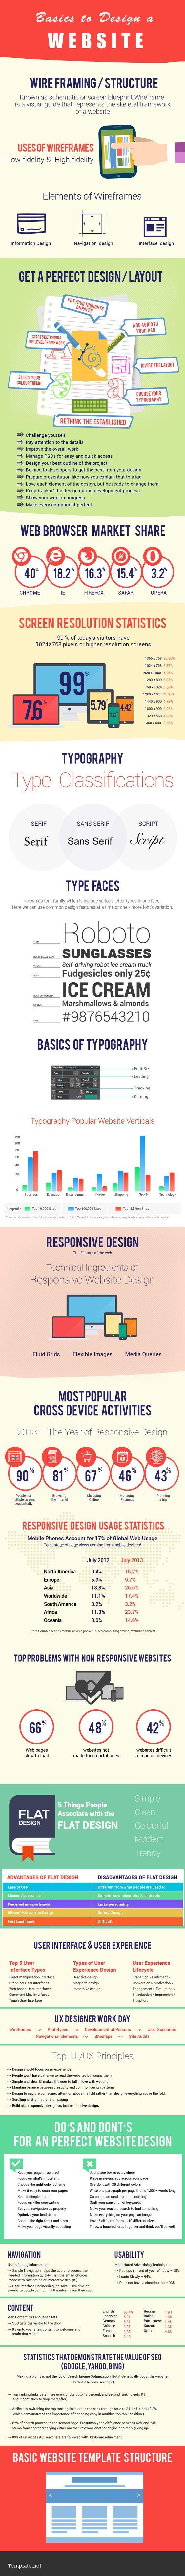 Layout photoshop web design website template tutorials tutorial 022 - Basics To Design A Website Infographic Http Fleetheratrace Blogspot Co